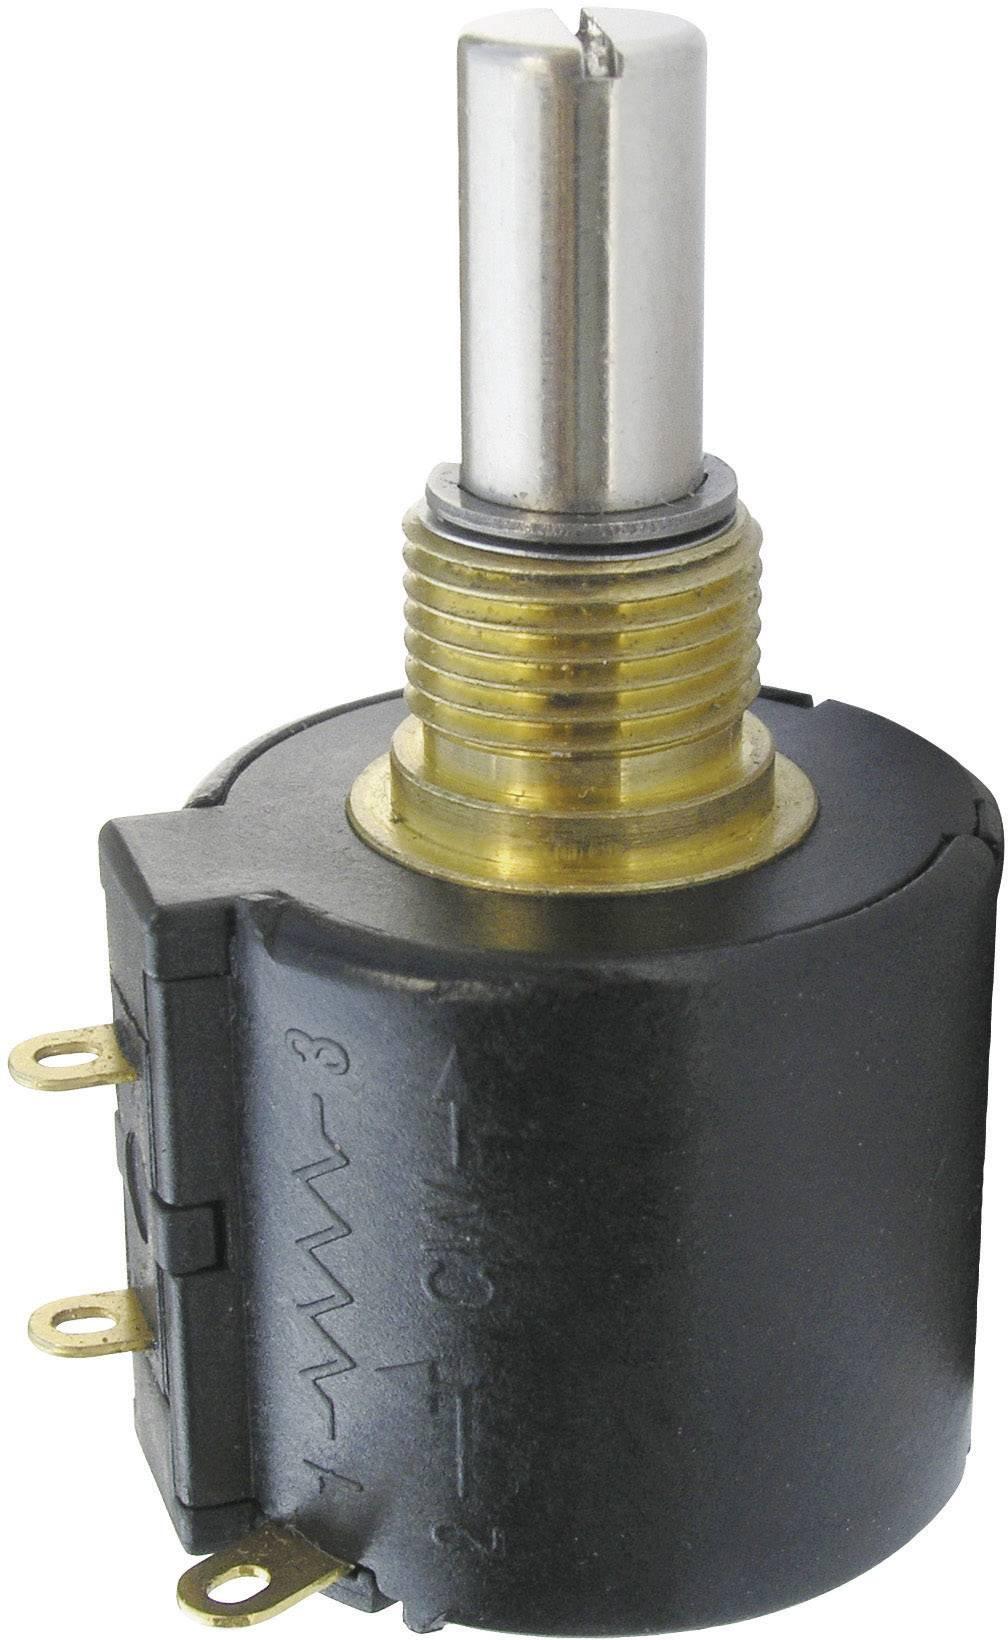 Presný potenciometer Wirewound, 10-cestný mono Bourns 3549S-1AA-503A 3549S-1AA-503A, 2 W, 50 kOhm, 1 ks